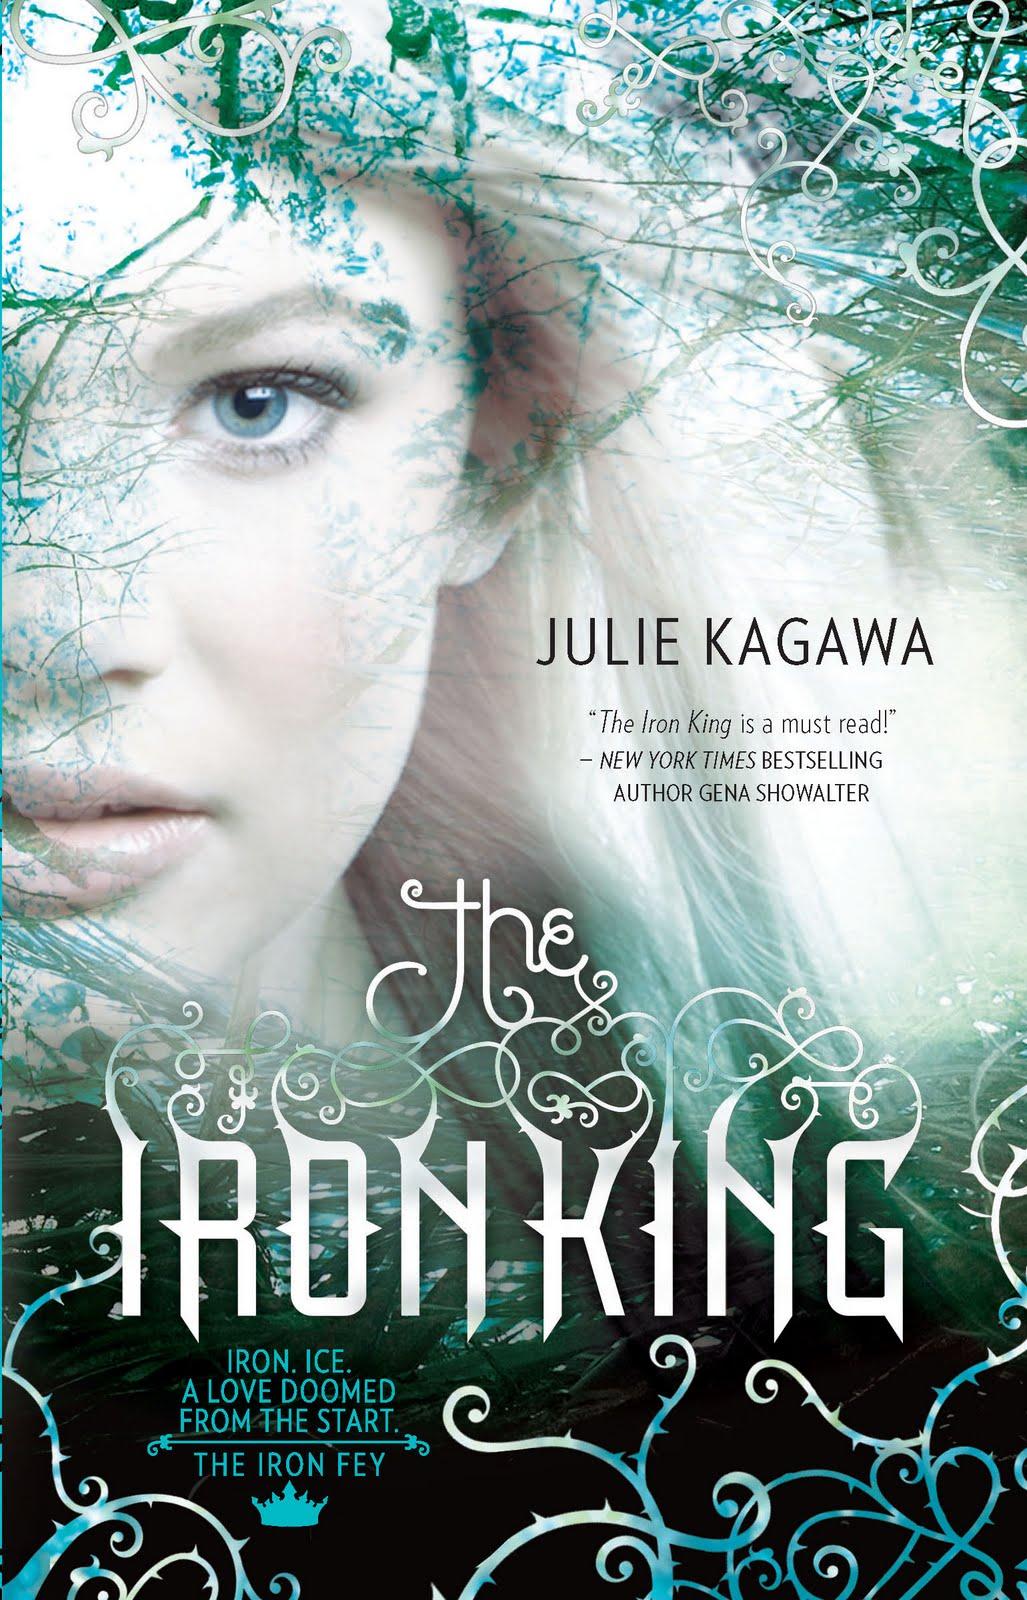 http://losesleepreading.blogspot.com.es/2014/11/resena-de-iron-king-de-julie-kagawa.html